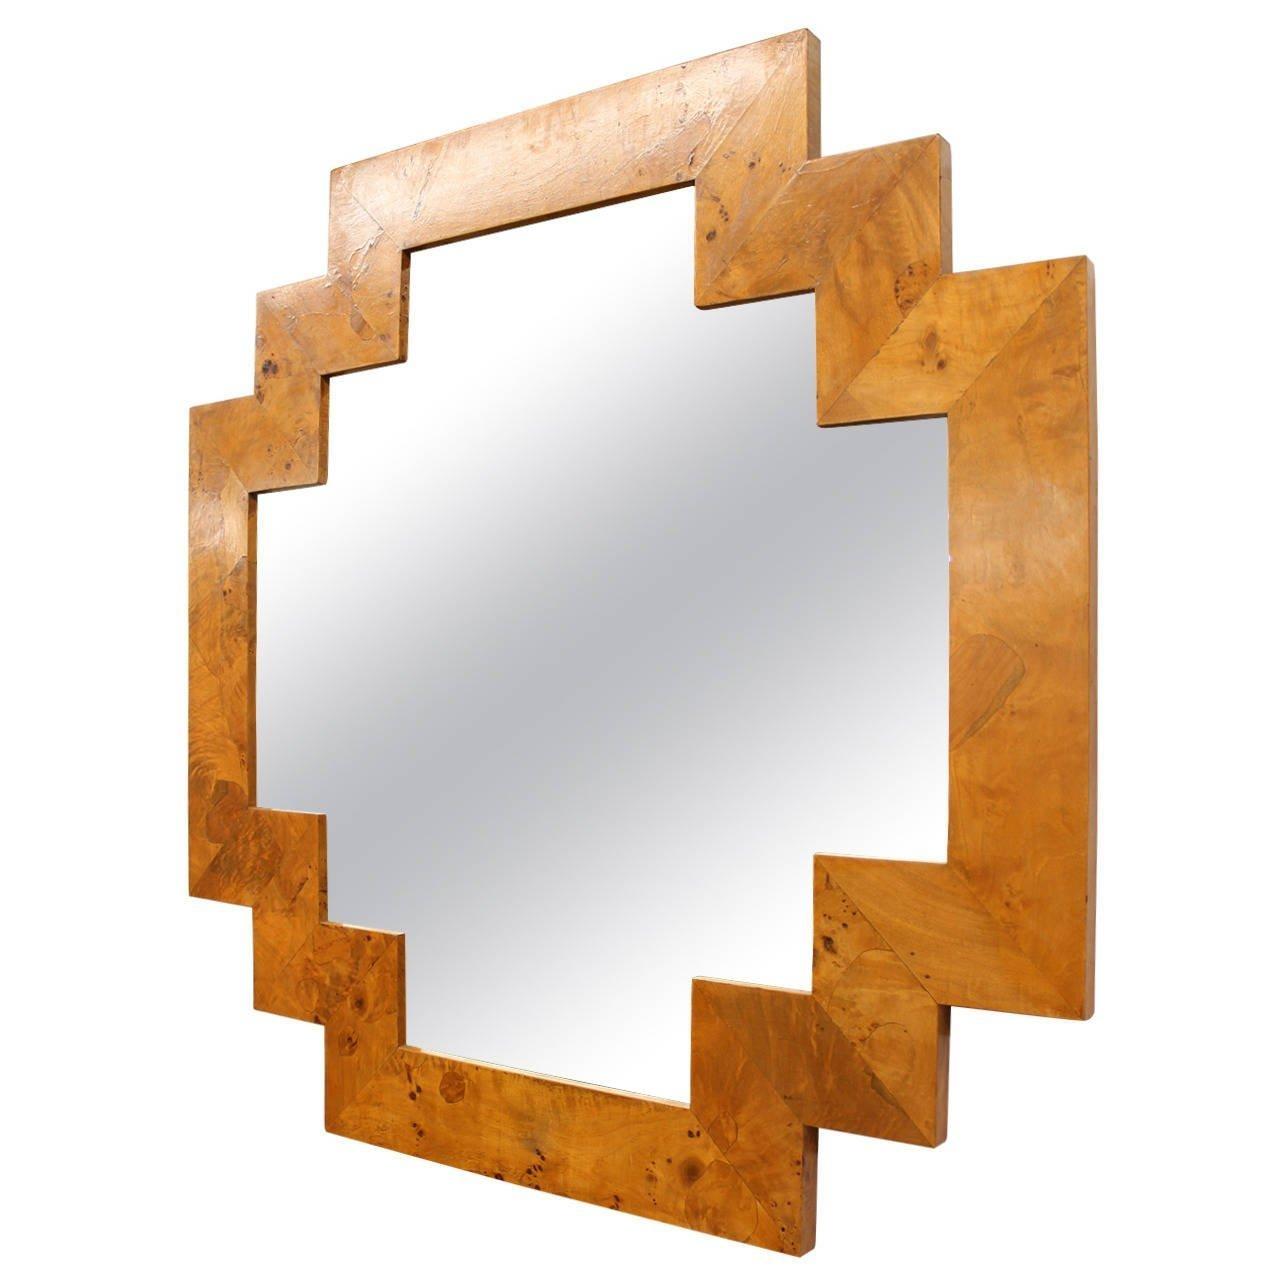 Art Deco Style Geometric Italian Burl Wood Wall Mirror At 1Stdibs Regarding Italian Inlaid Wood Wall Art (View 17 of 20)